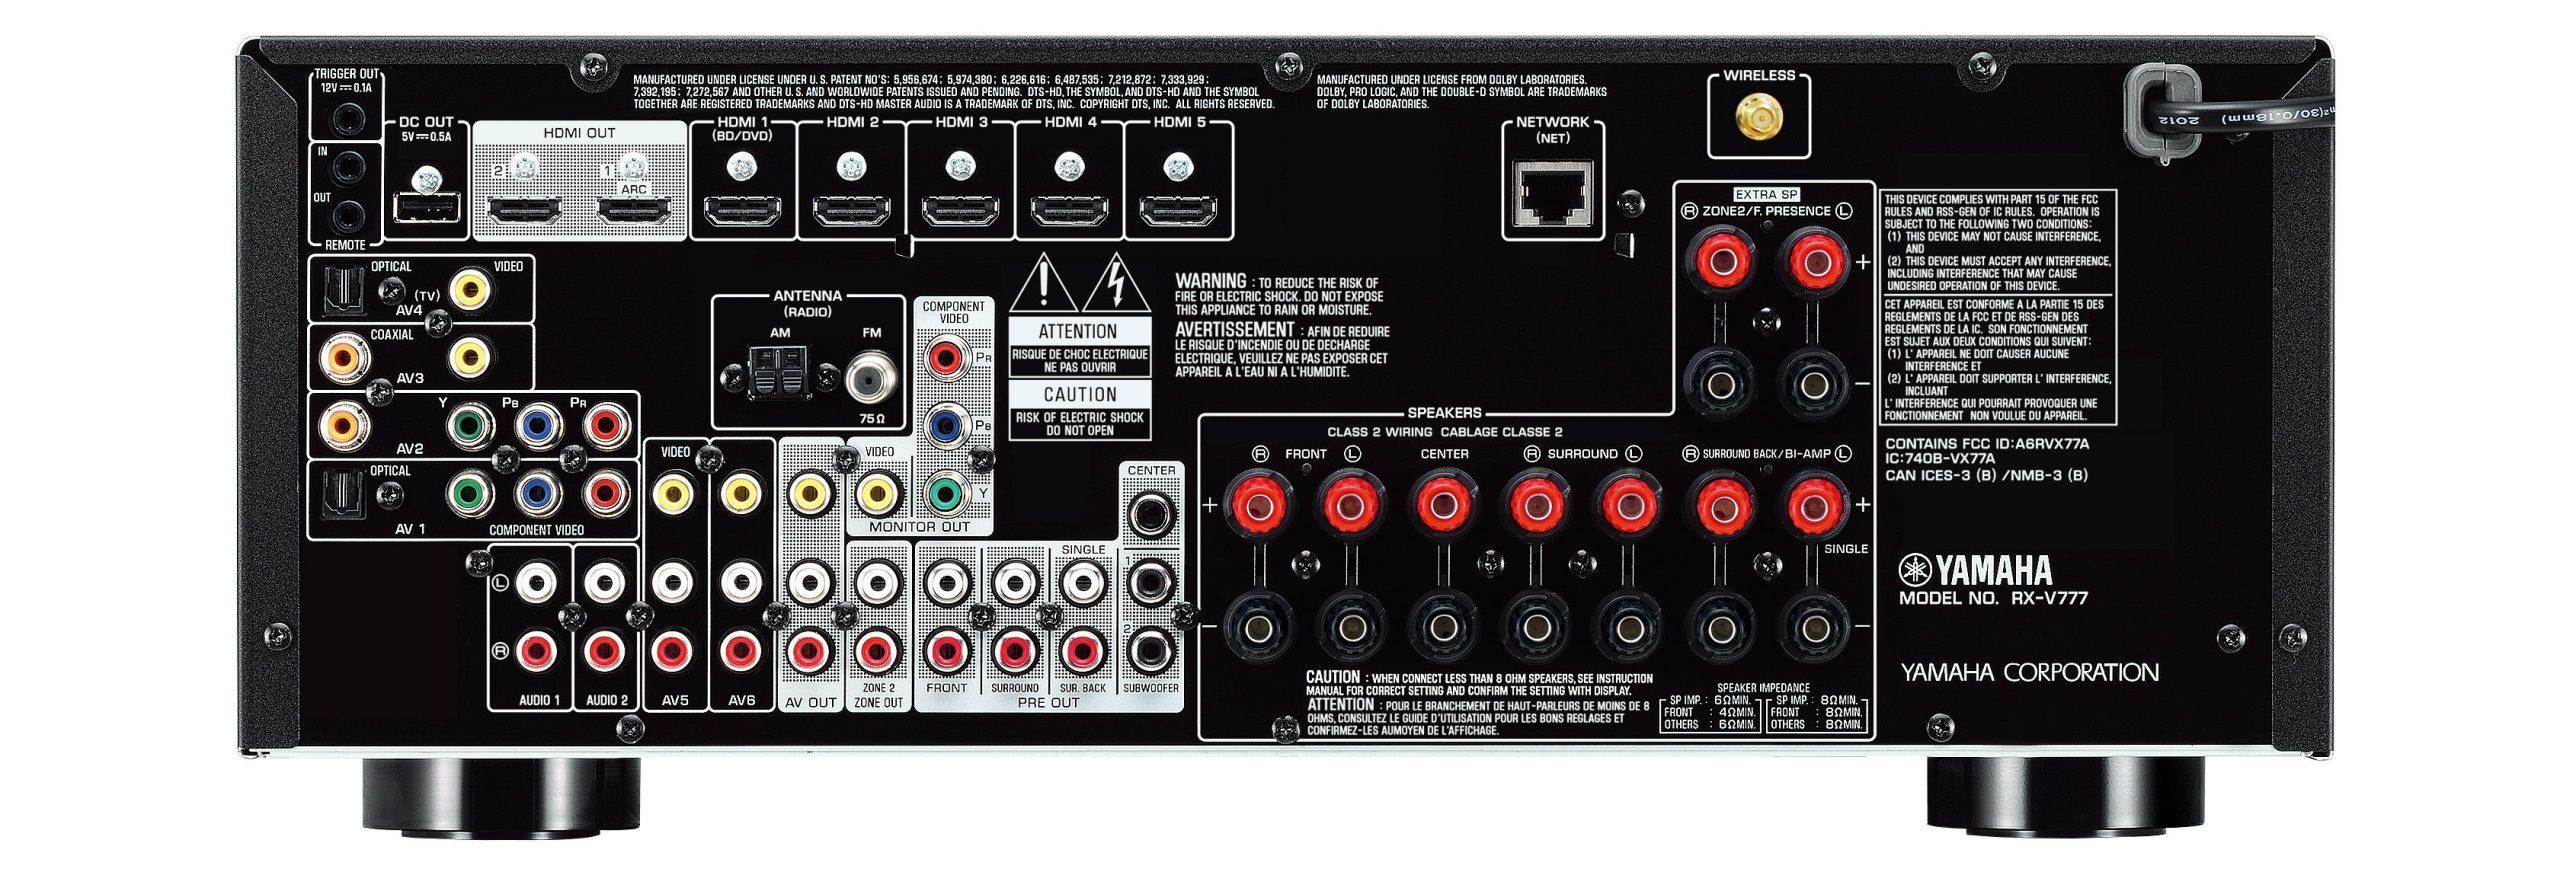 Yamaha RX-V777 inputs